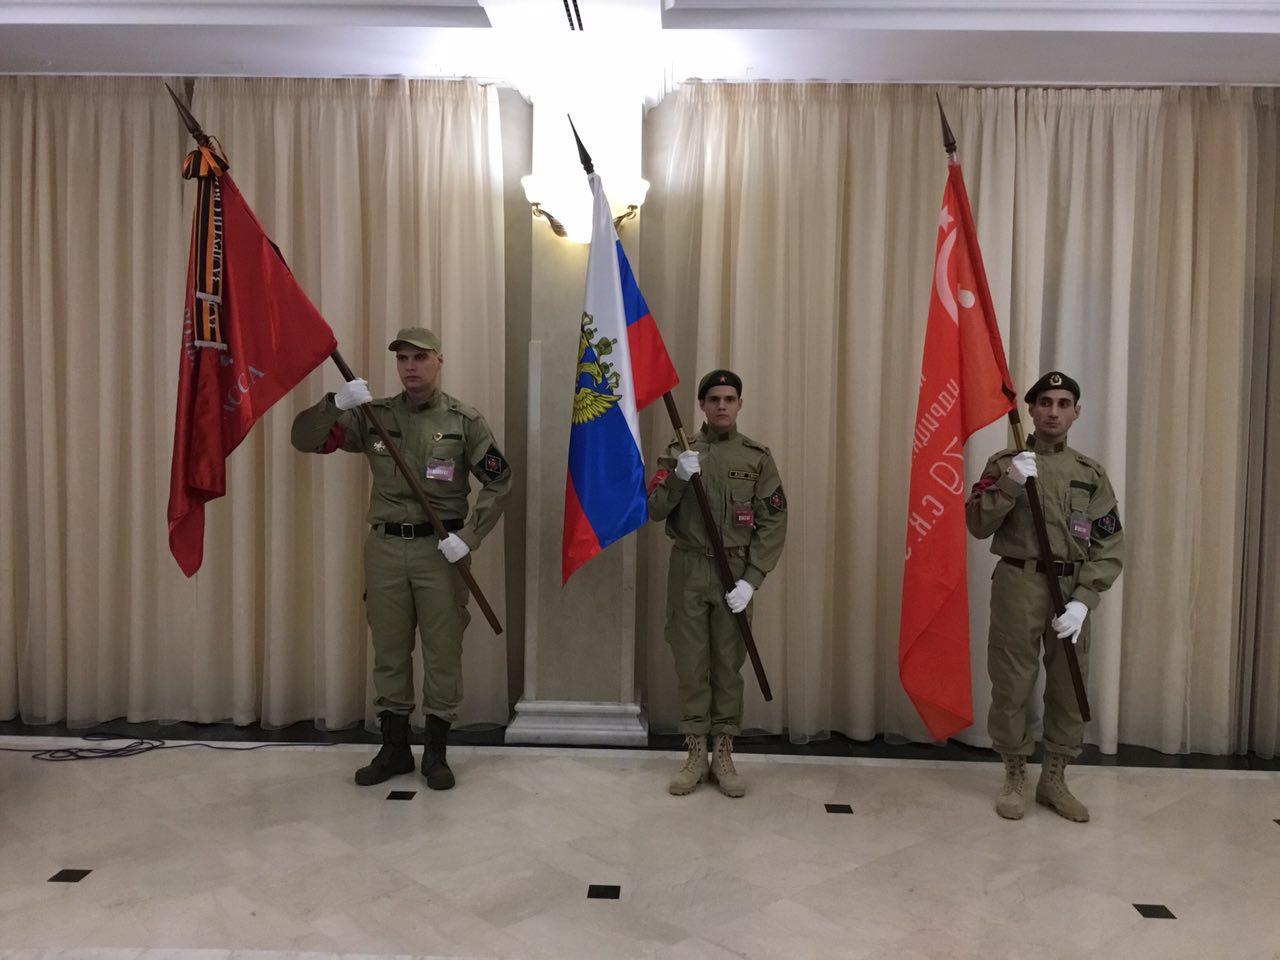 Дел хватает: глава Союза добровольцев Донбасса рассказал о работе на Дону